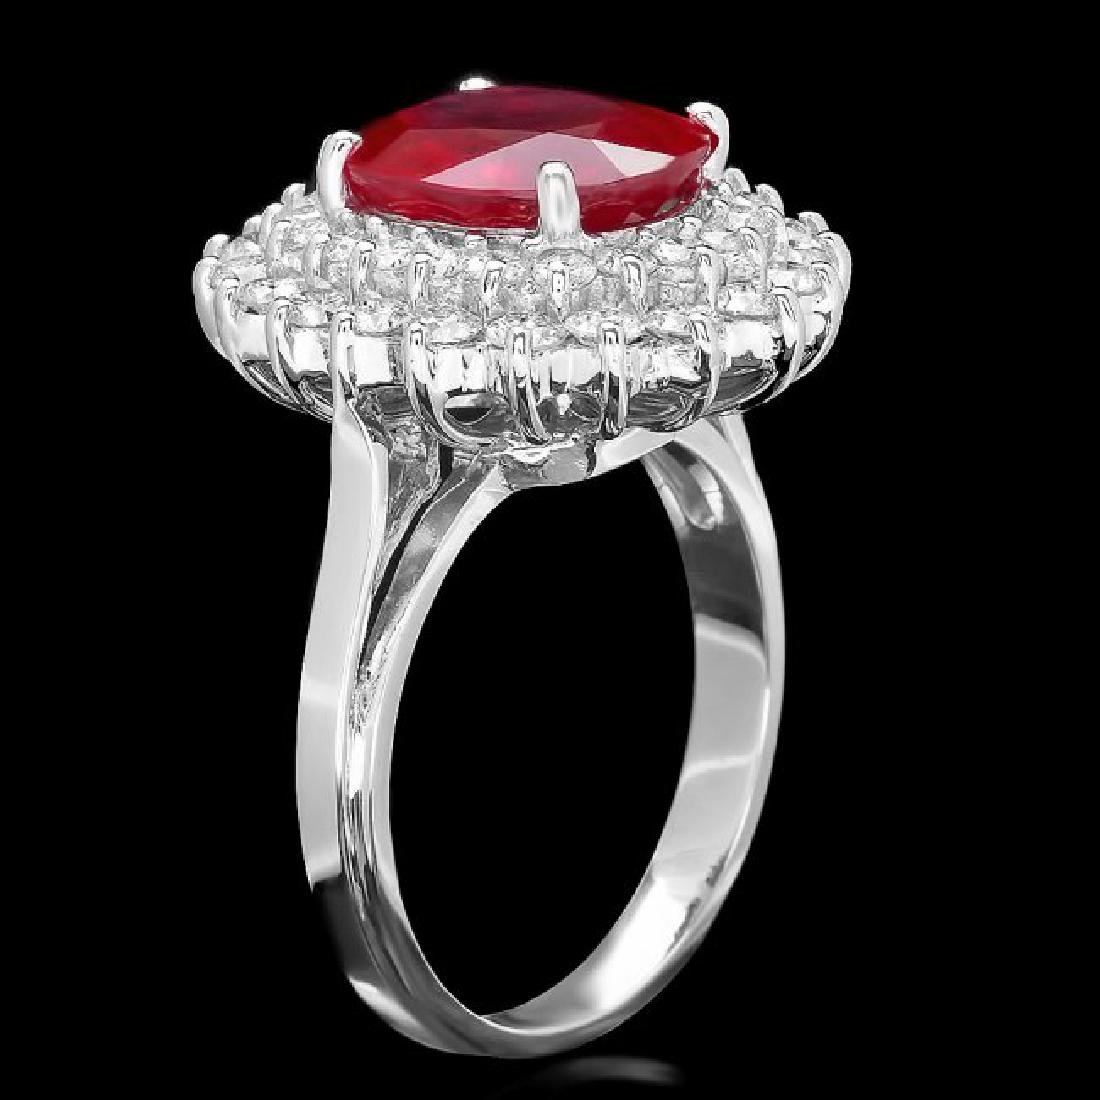 14k White Gold 4.50ct Ruby 1.40ct Diamond Ring - 2